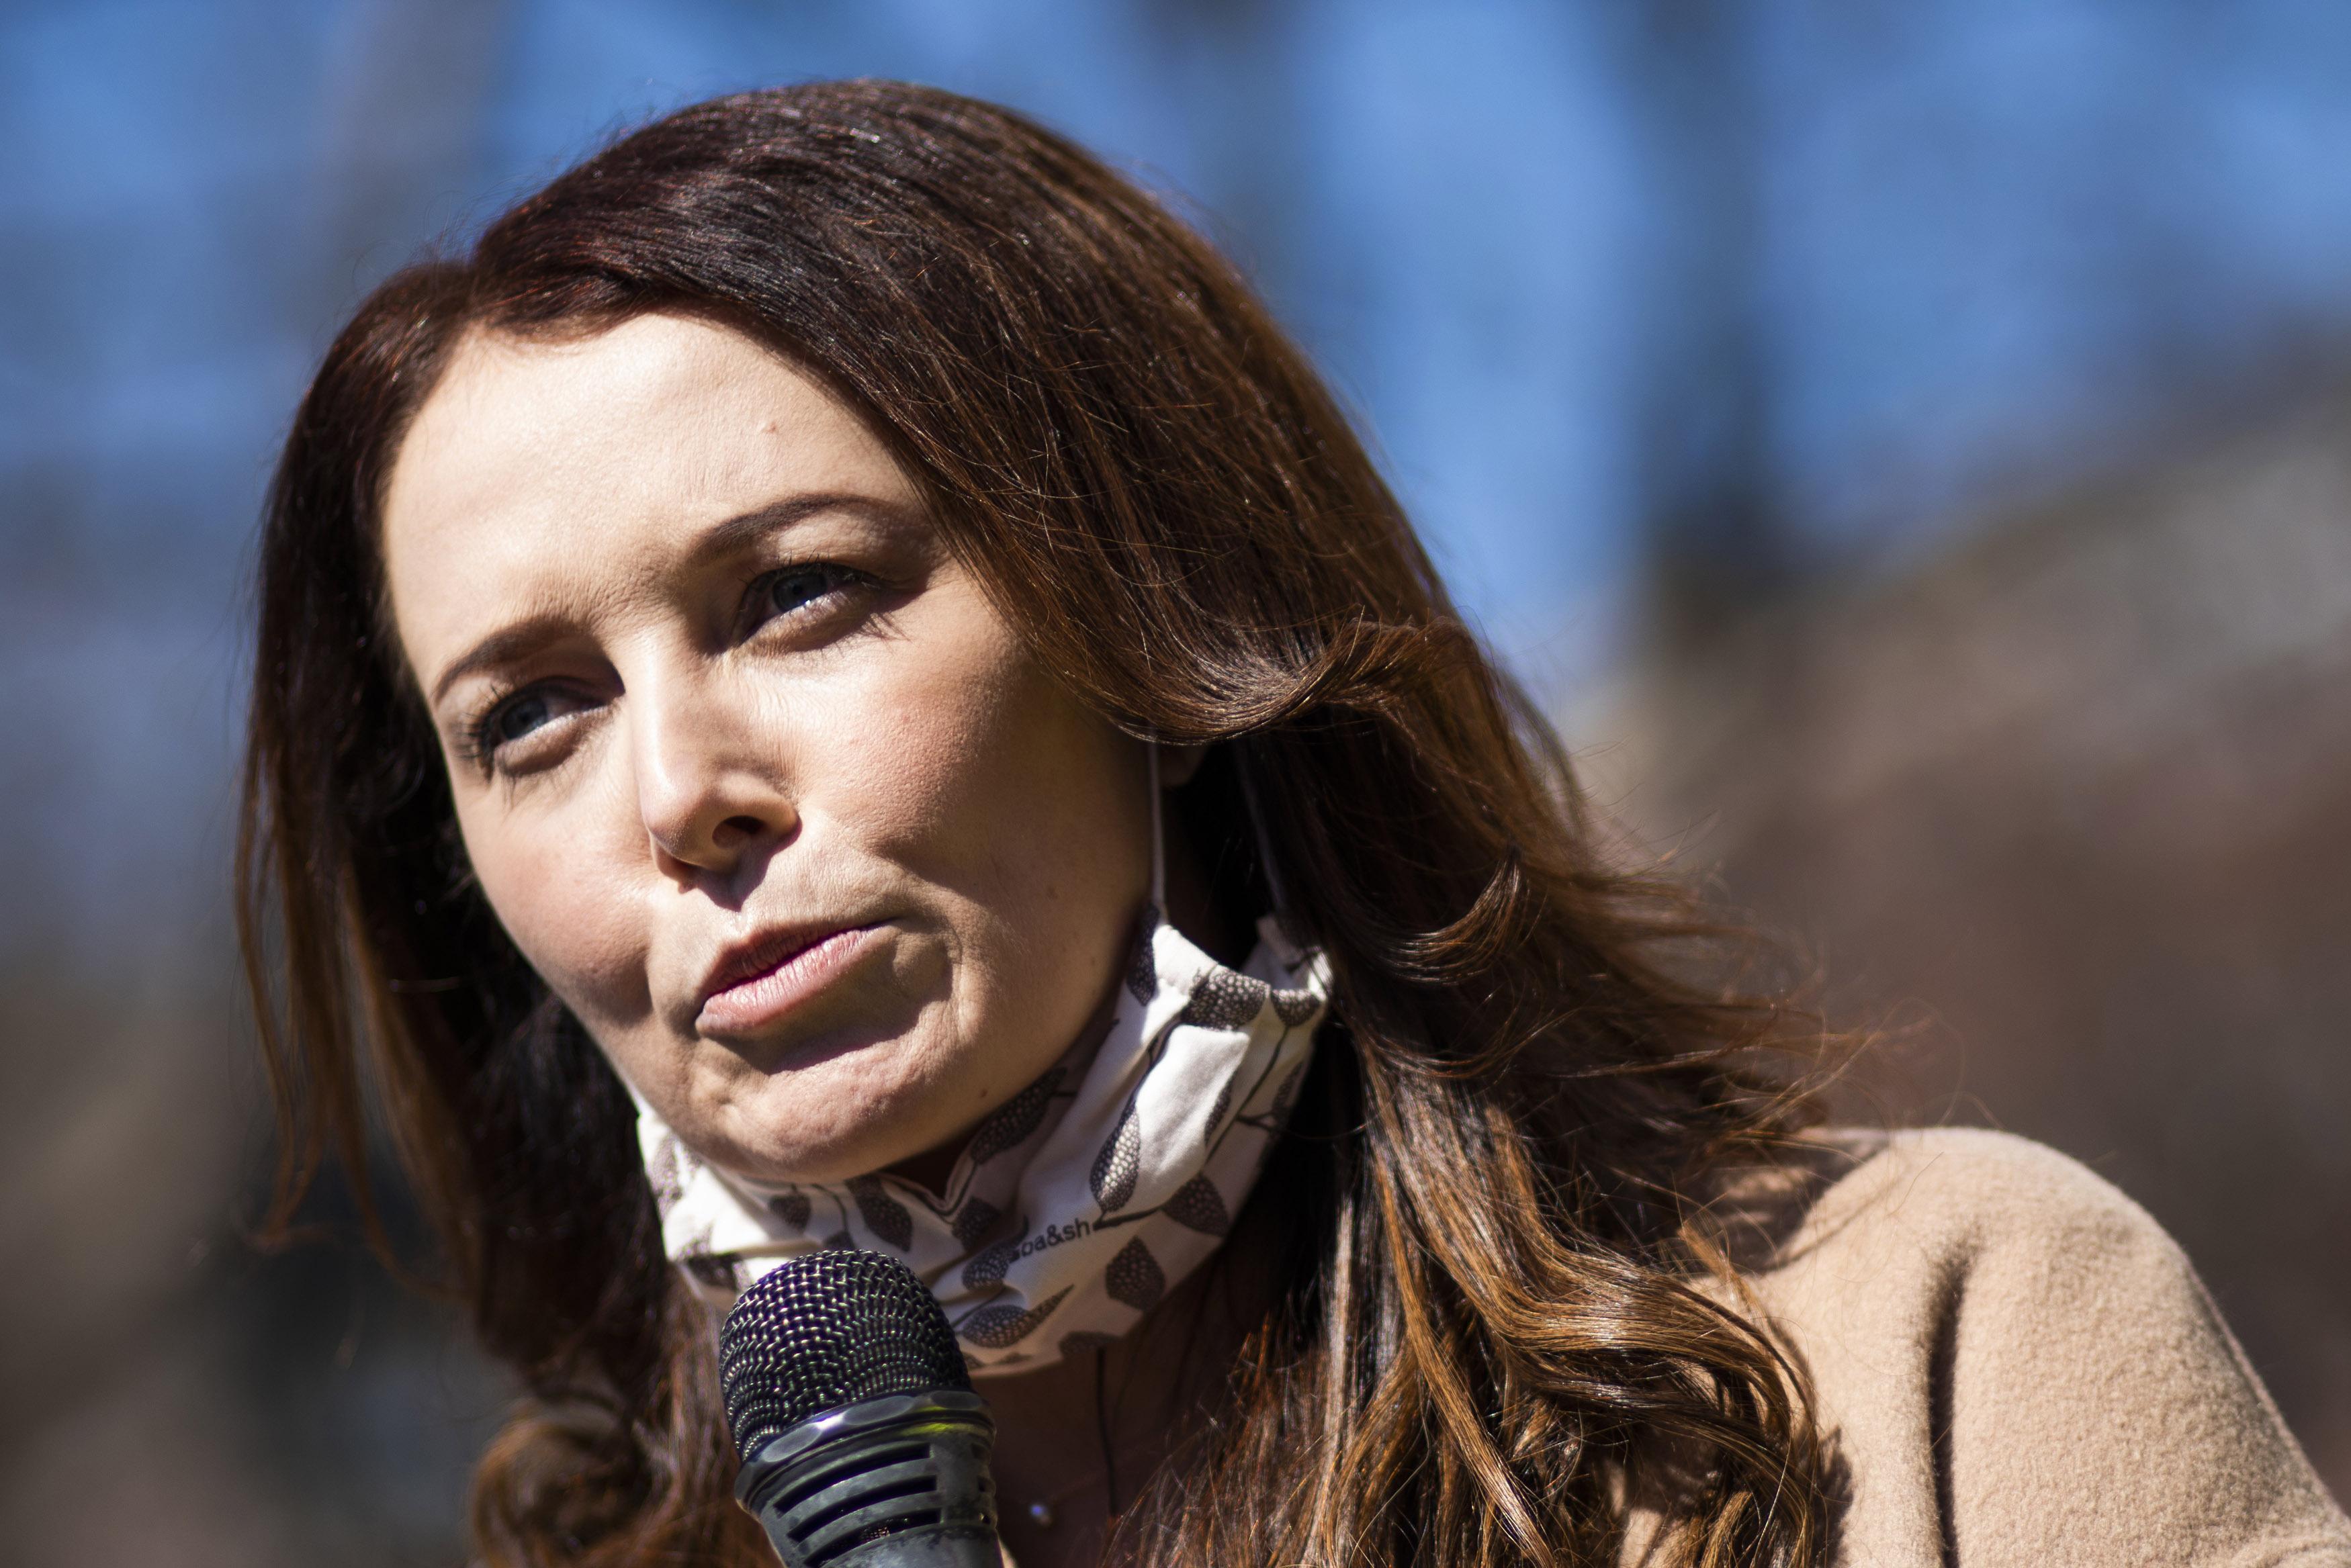 紐約州州長郭謨(Andrew Cuomo)性騷擾案受害者波伊蘭(Lindsey Boylan)(AP)